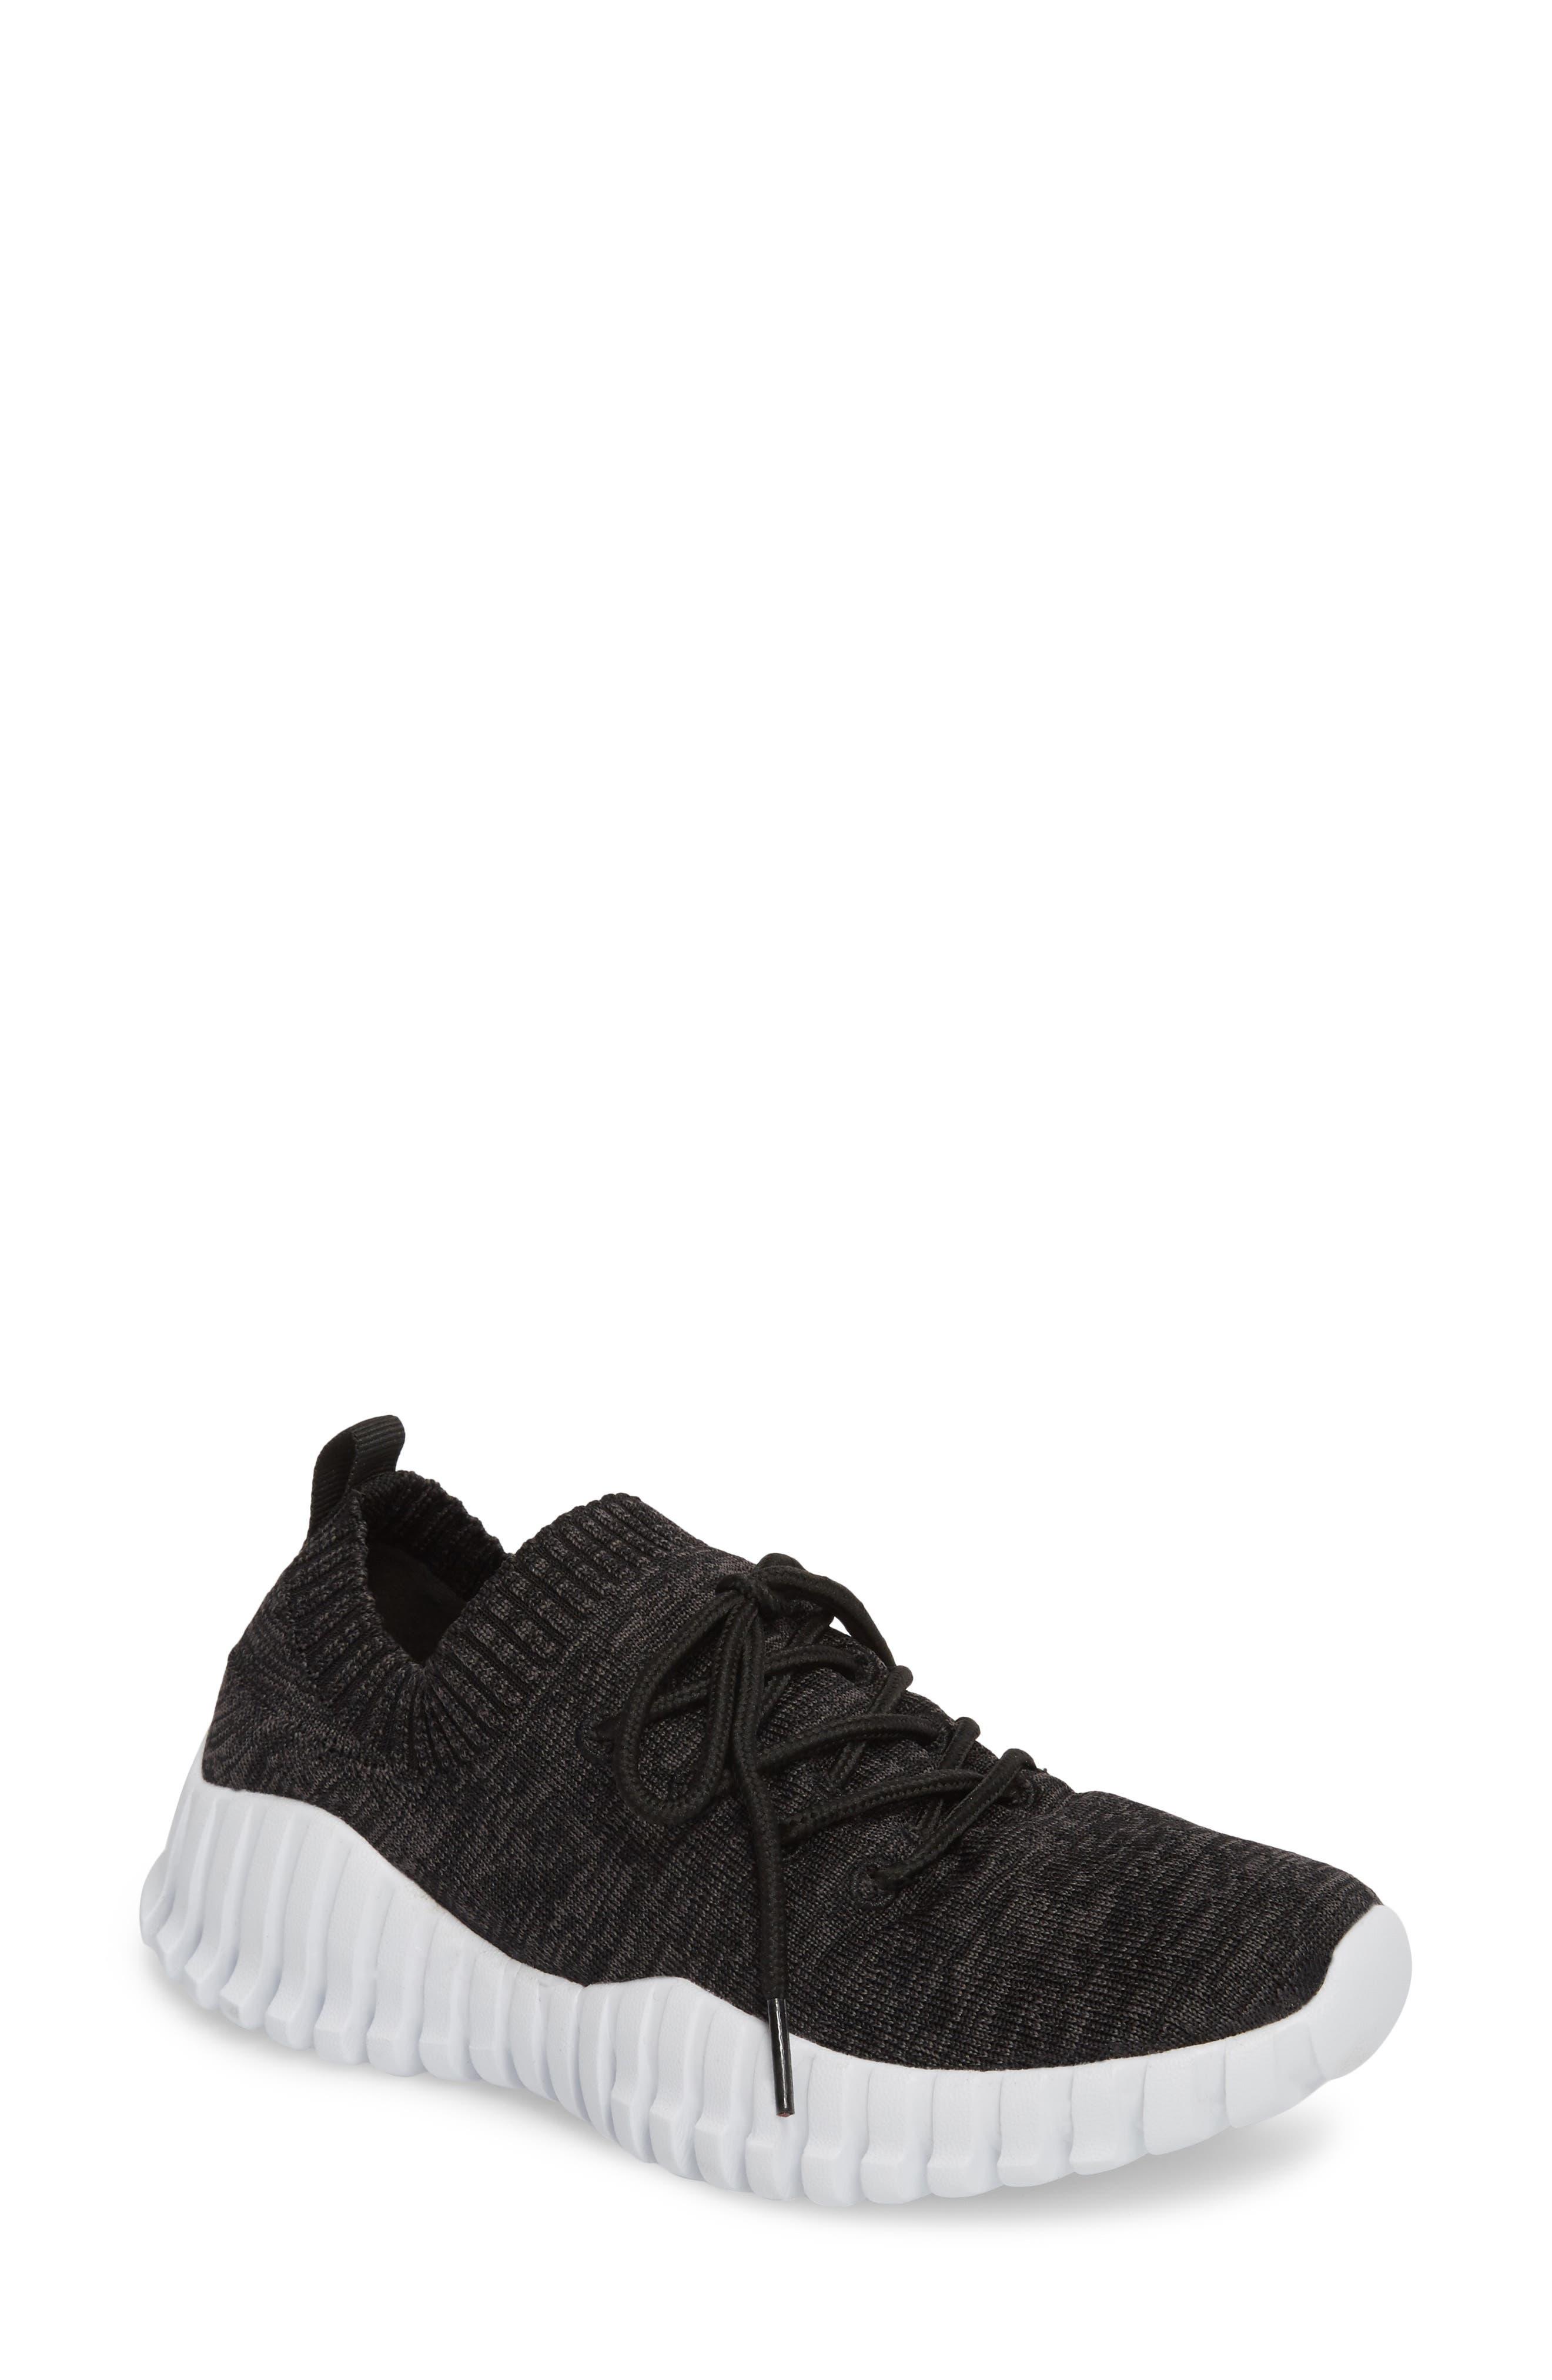 Gravity Sneaker,                             Main thumbnail 1, color,                             BLACK GREY